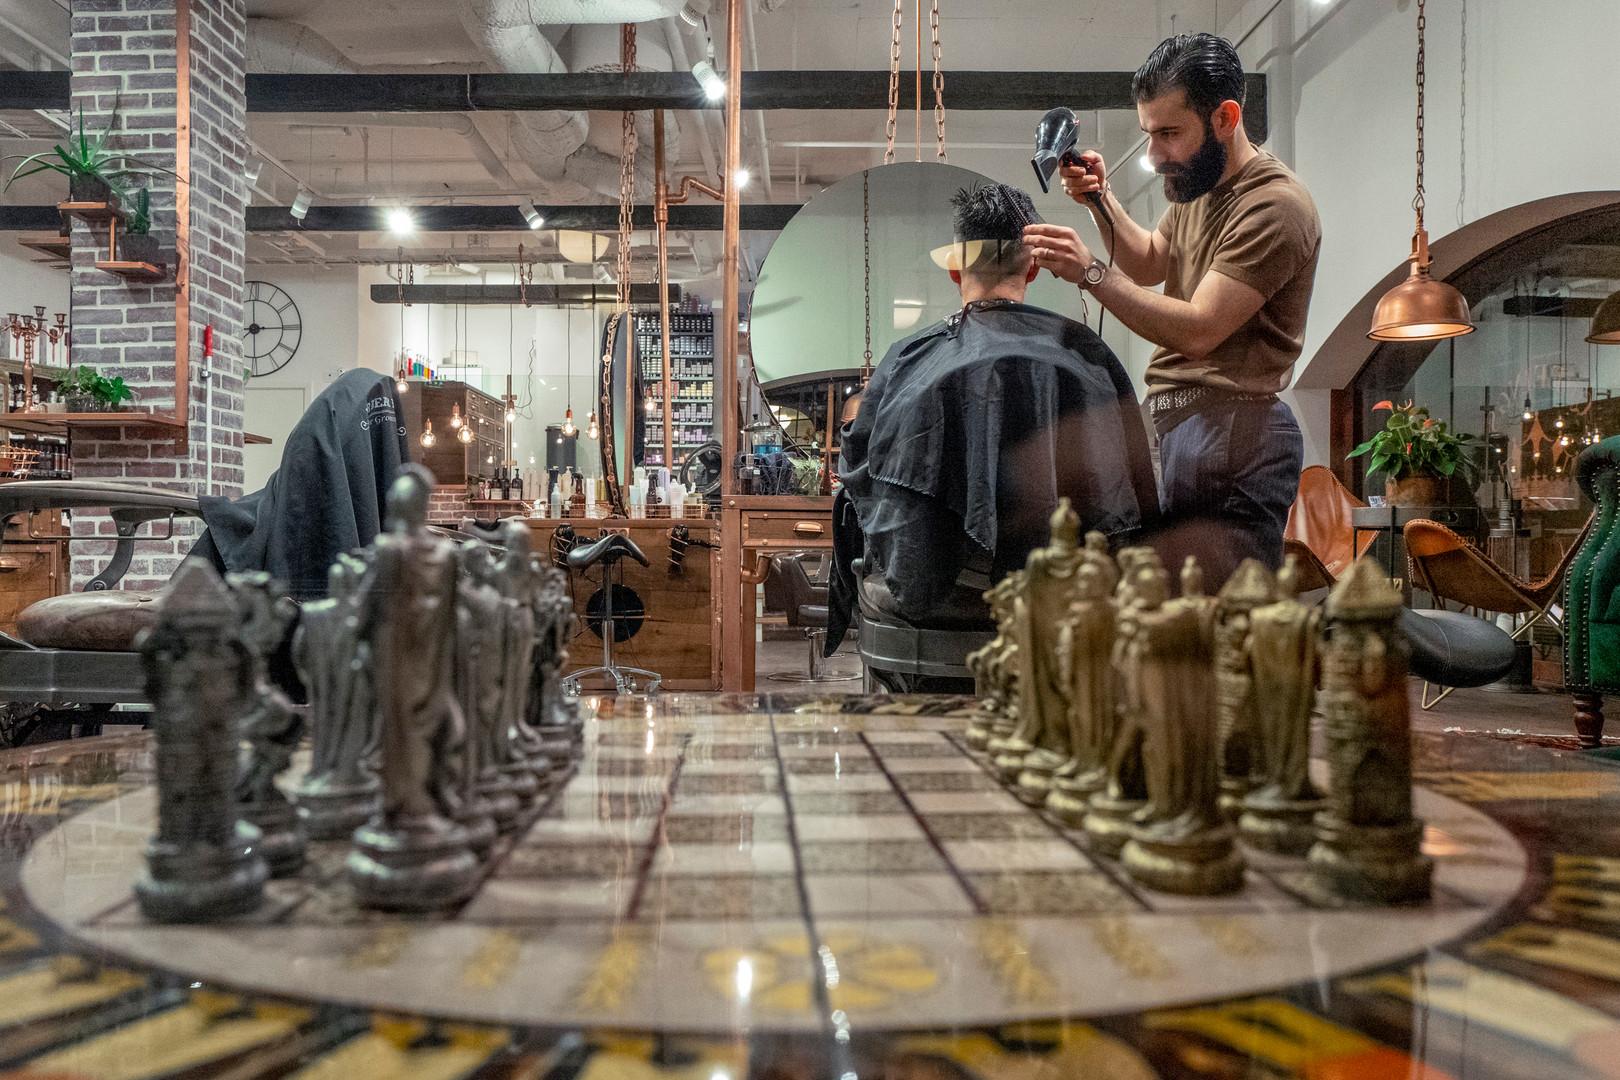 Barber shop in Uppsala